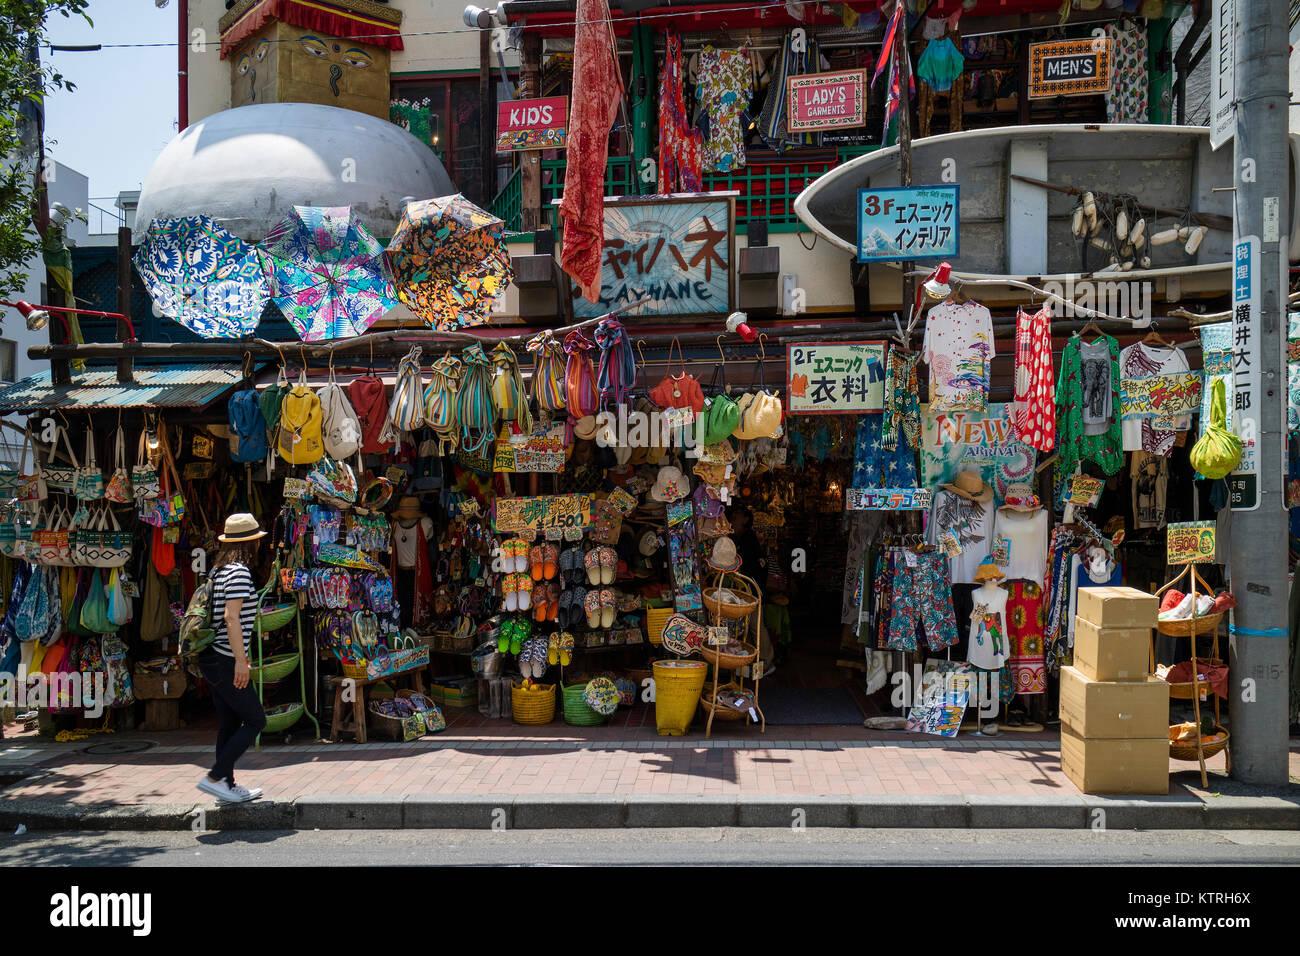 Yokohama - Japan, June 16, 2017; Colorful traditional souvenir shop in China town, Yokohama city - Stock Image